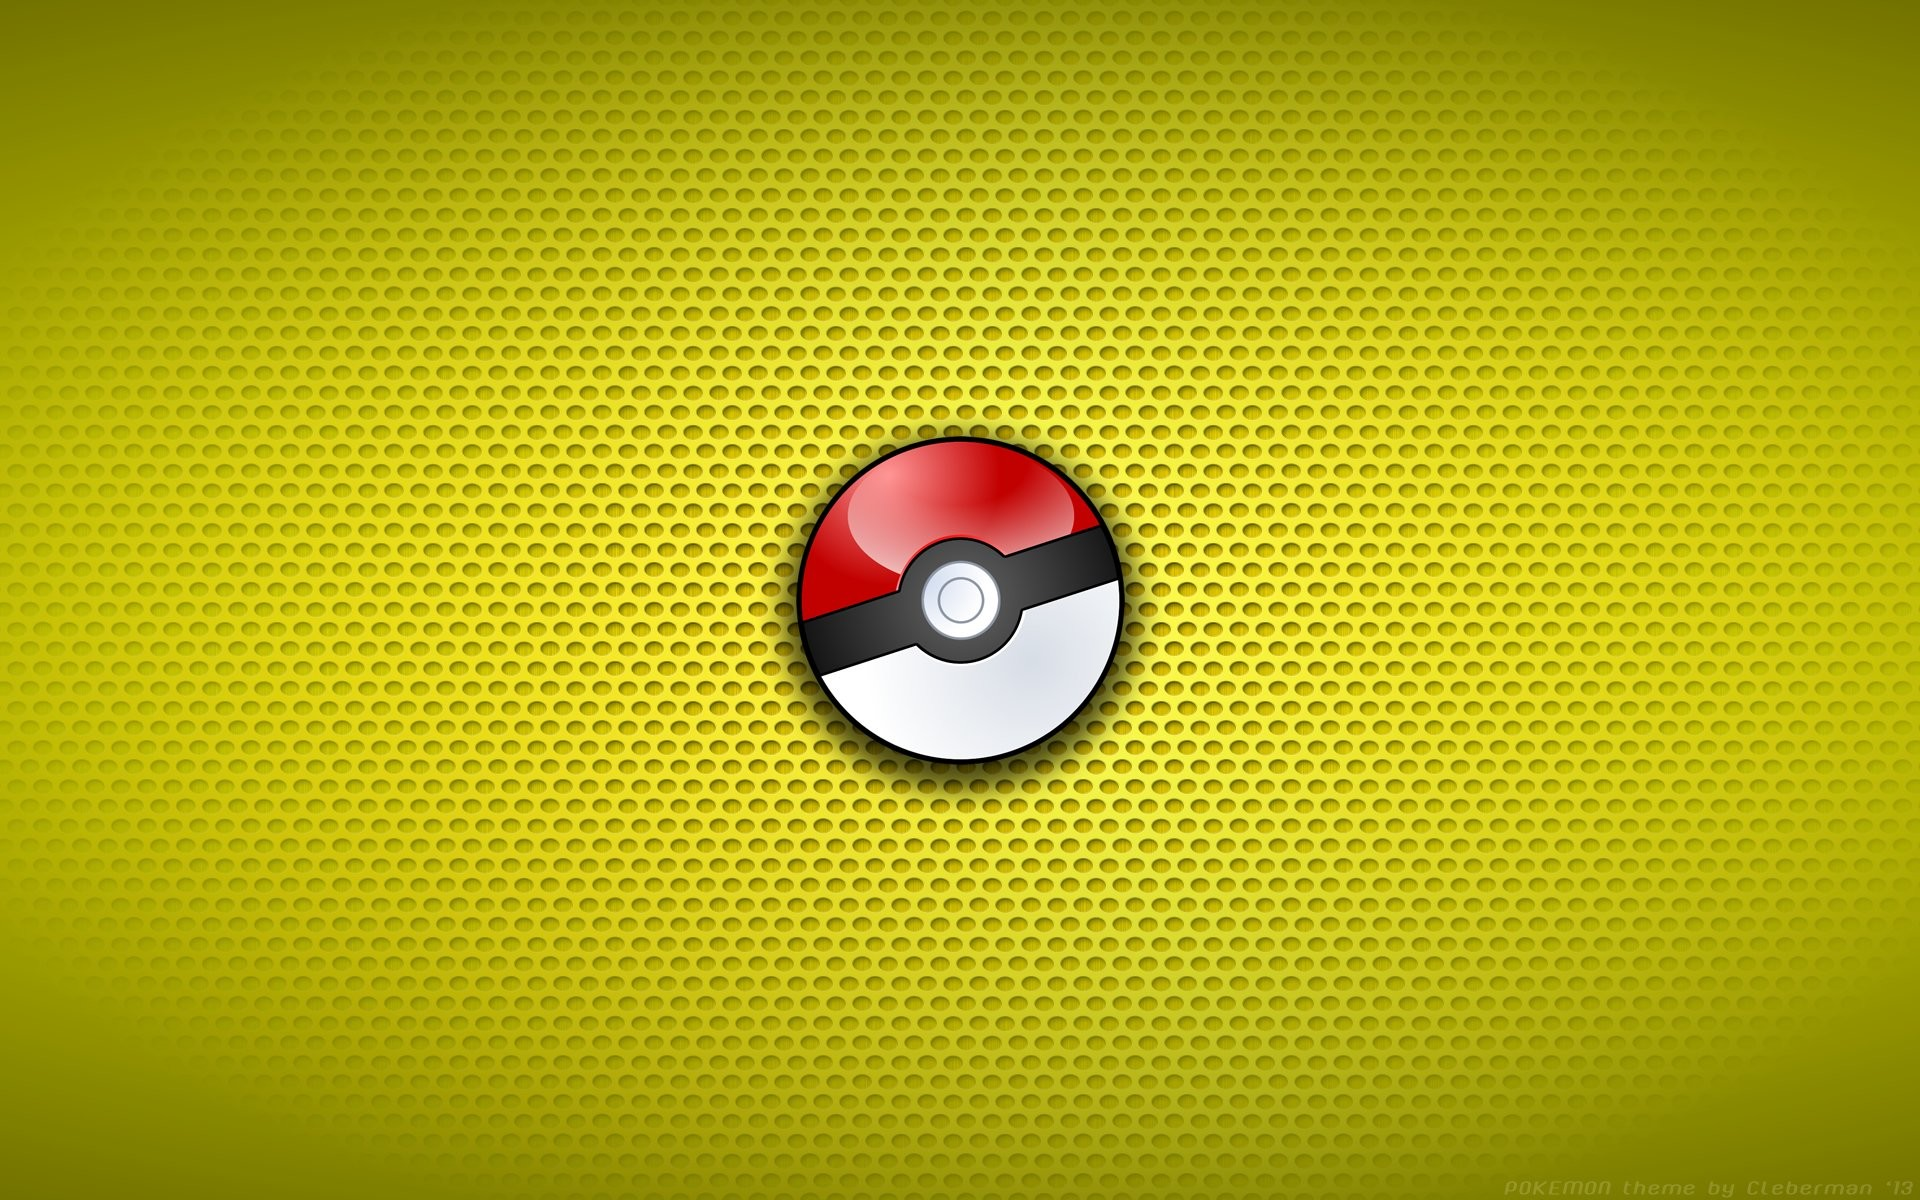 Pokeball Shiny Pokémon Umbreon · HD Wallpaper | Background ID:380868